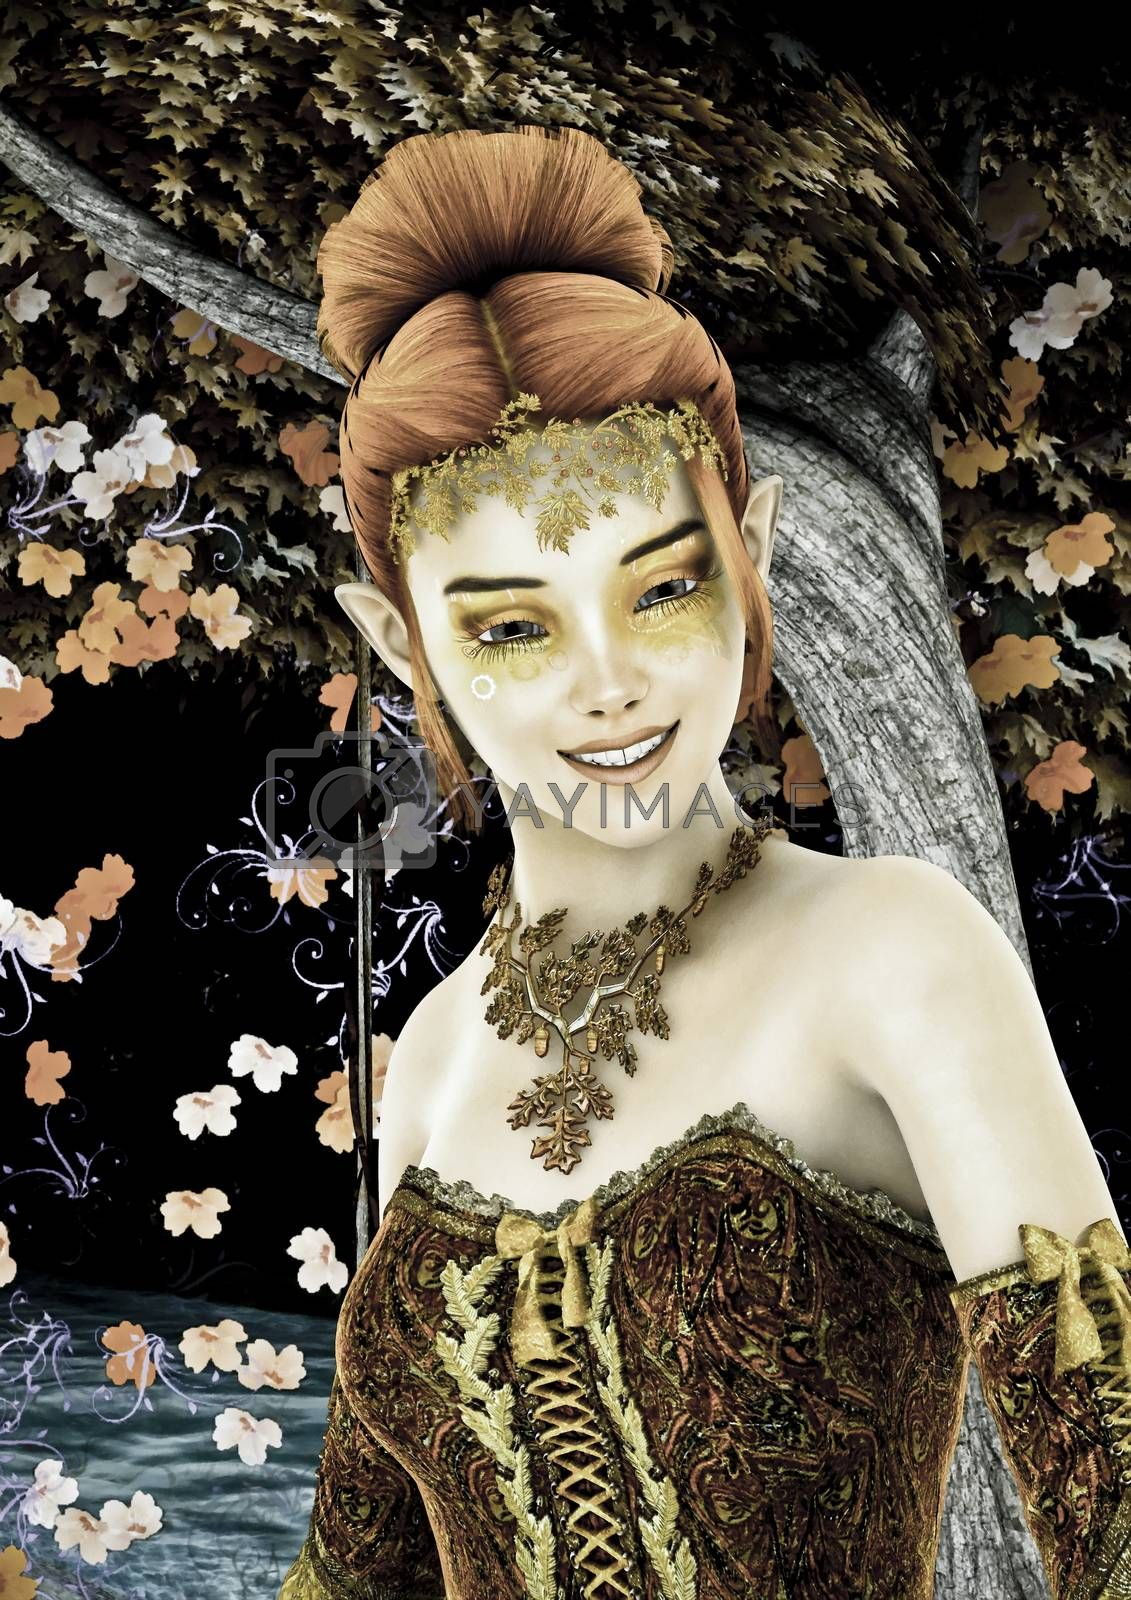 3D digital render of a beautiful princess of autumn ona fantasy garden background